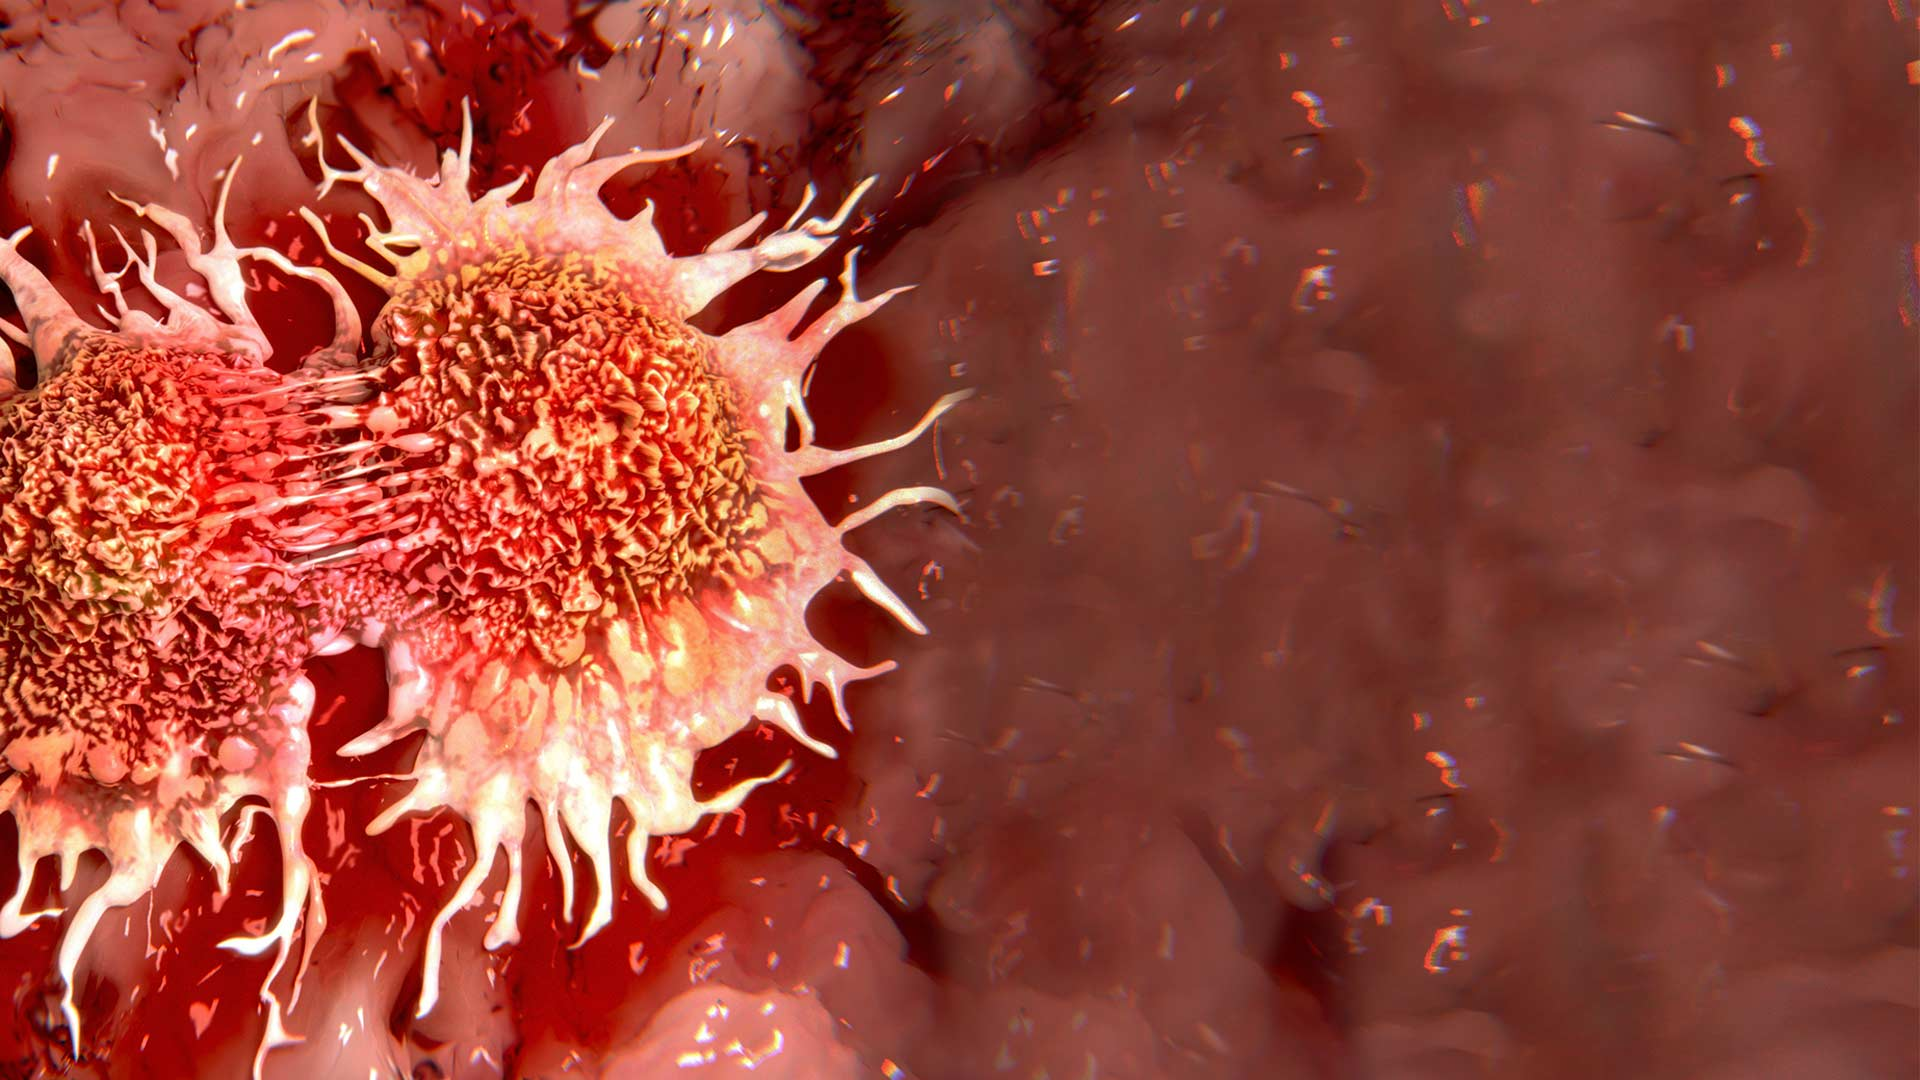 Discovery of angiogenesis